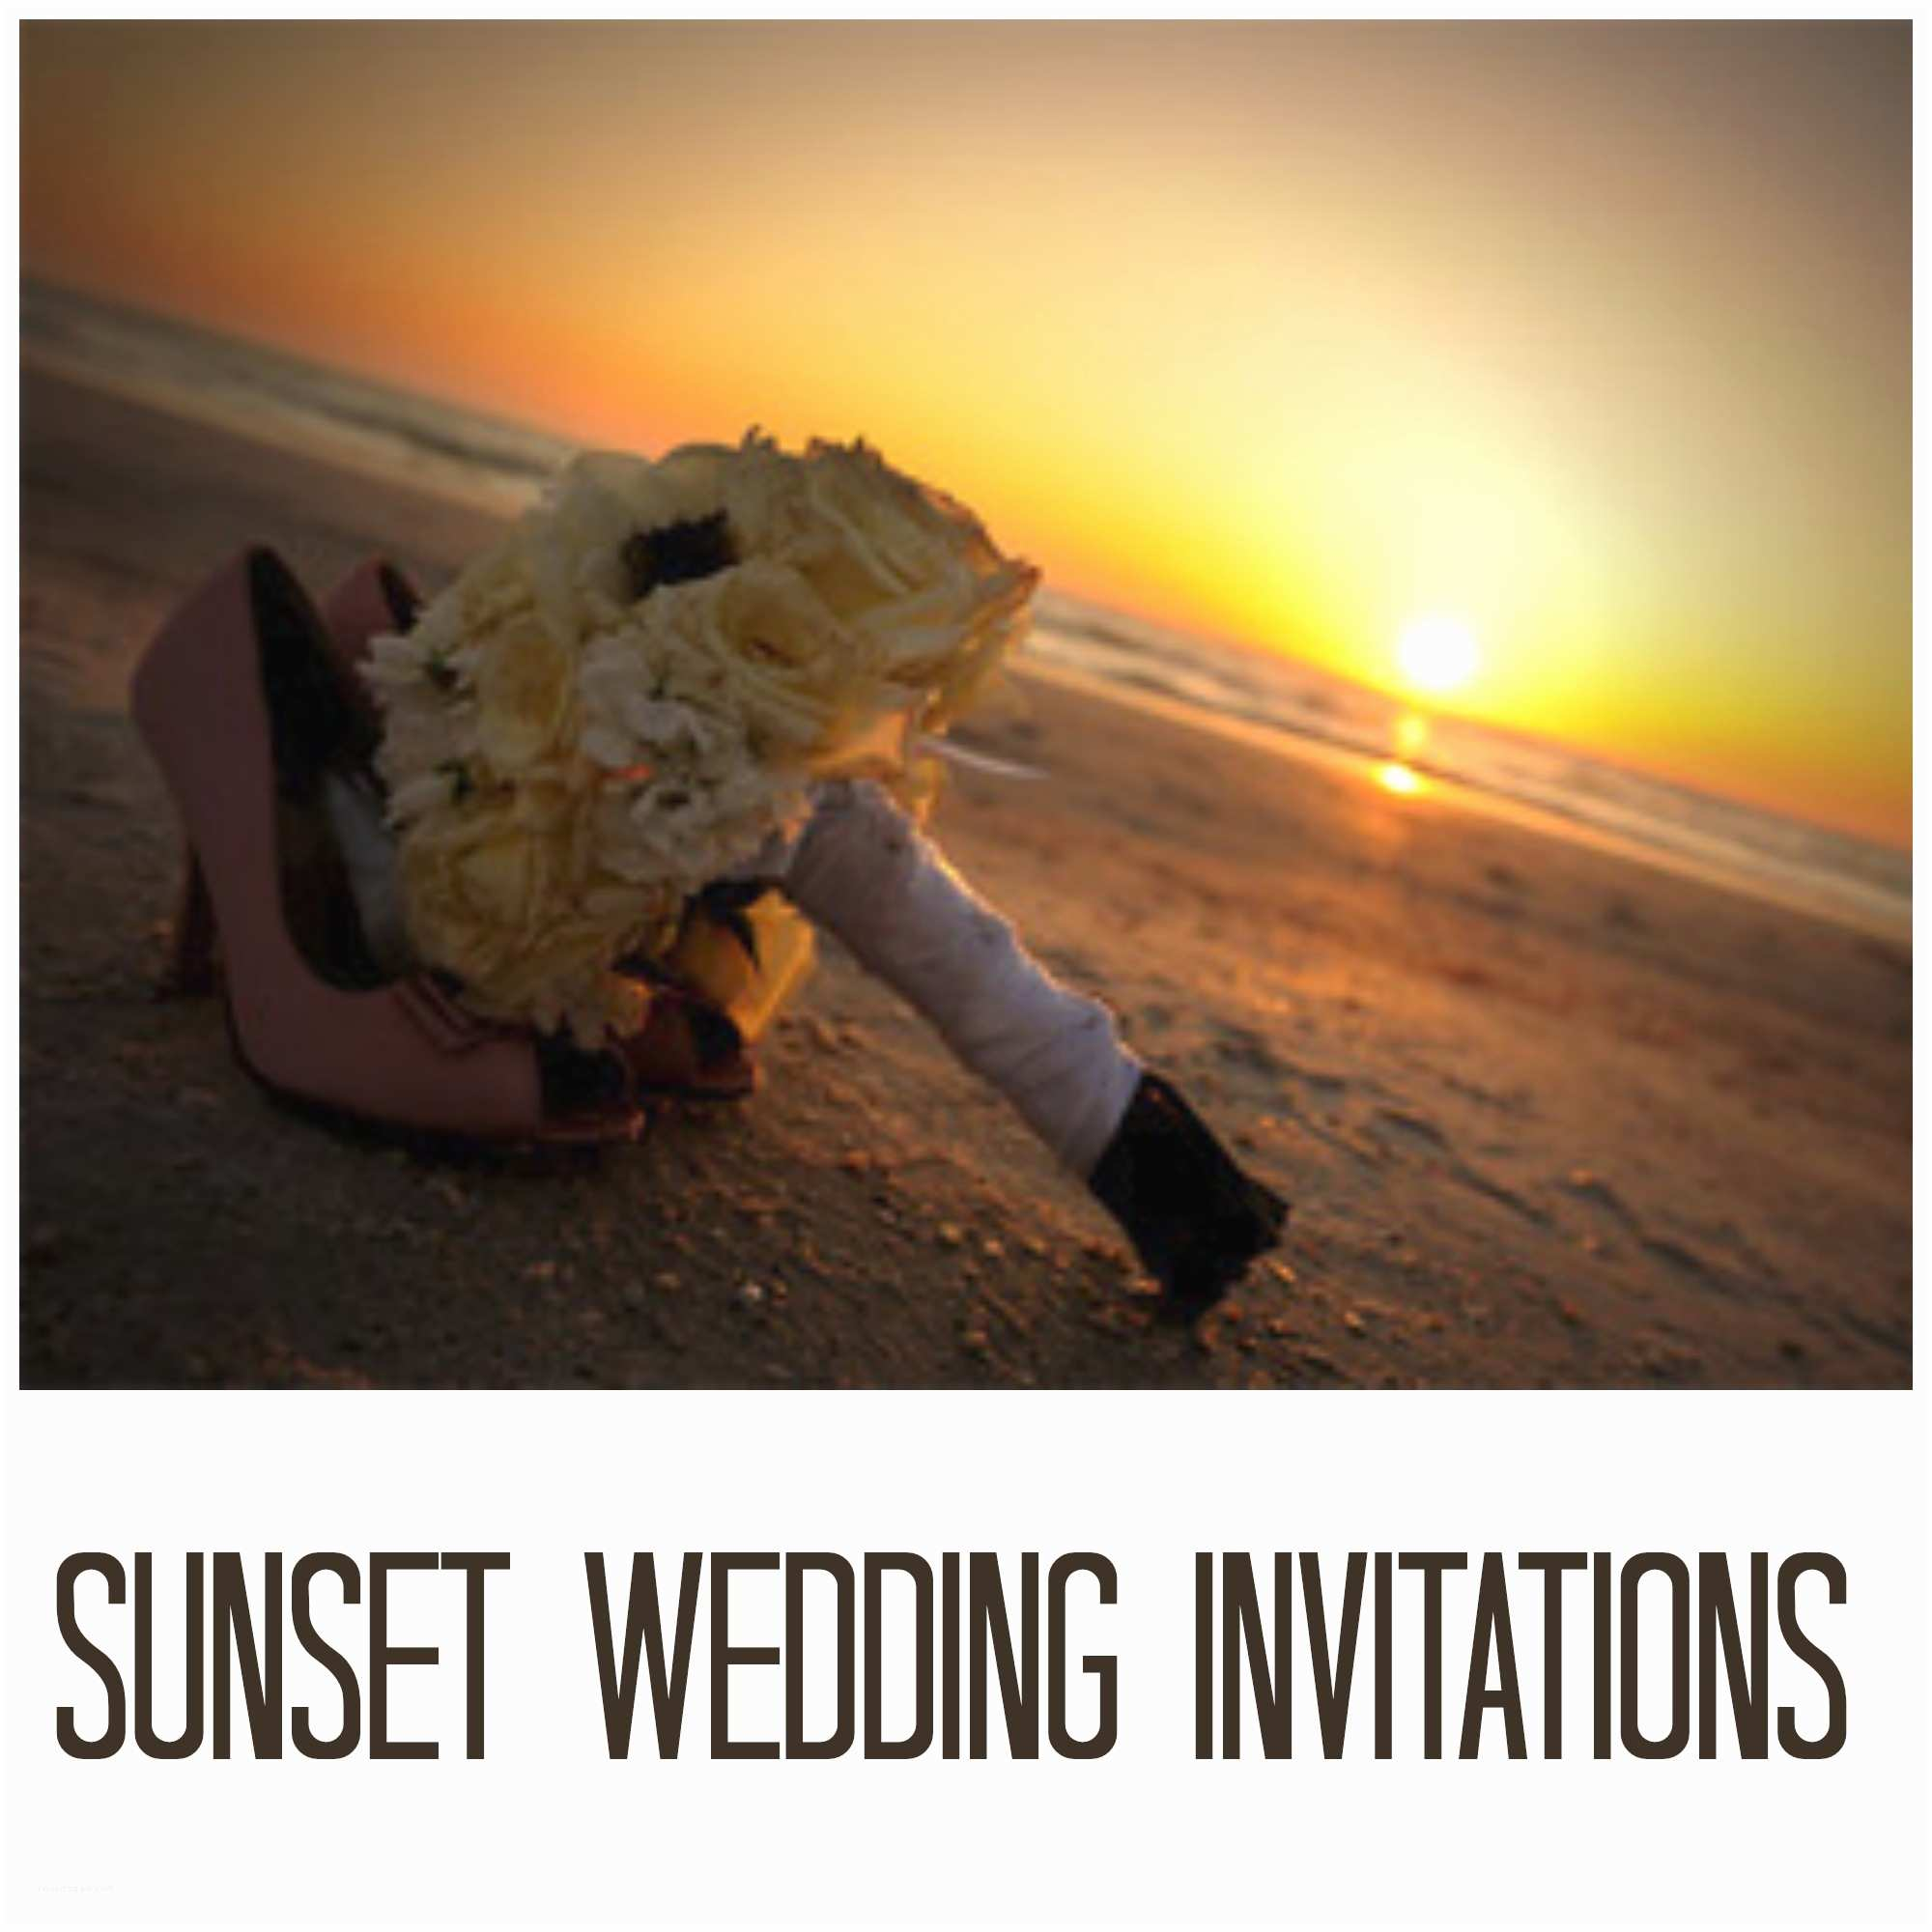 Sunset Beach Wedding Invitations Wedding Invitation Wording Sunset Beach Wedding